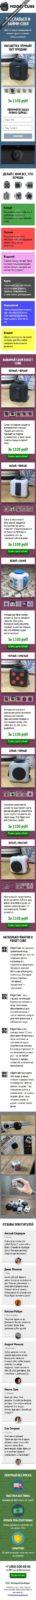 Скриншот Готового лендинга Fidget Cube кубик антистресс 001 - моб